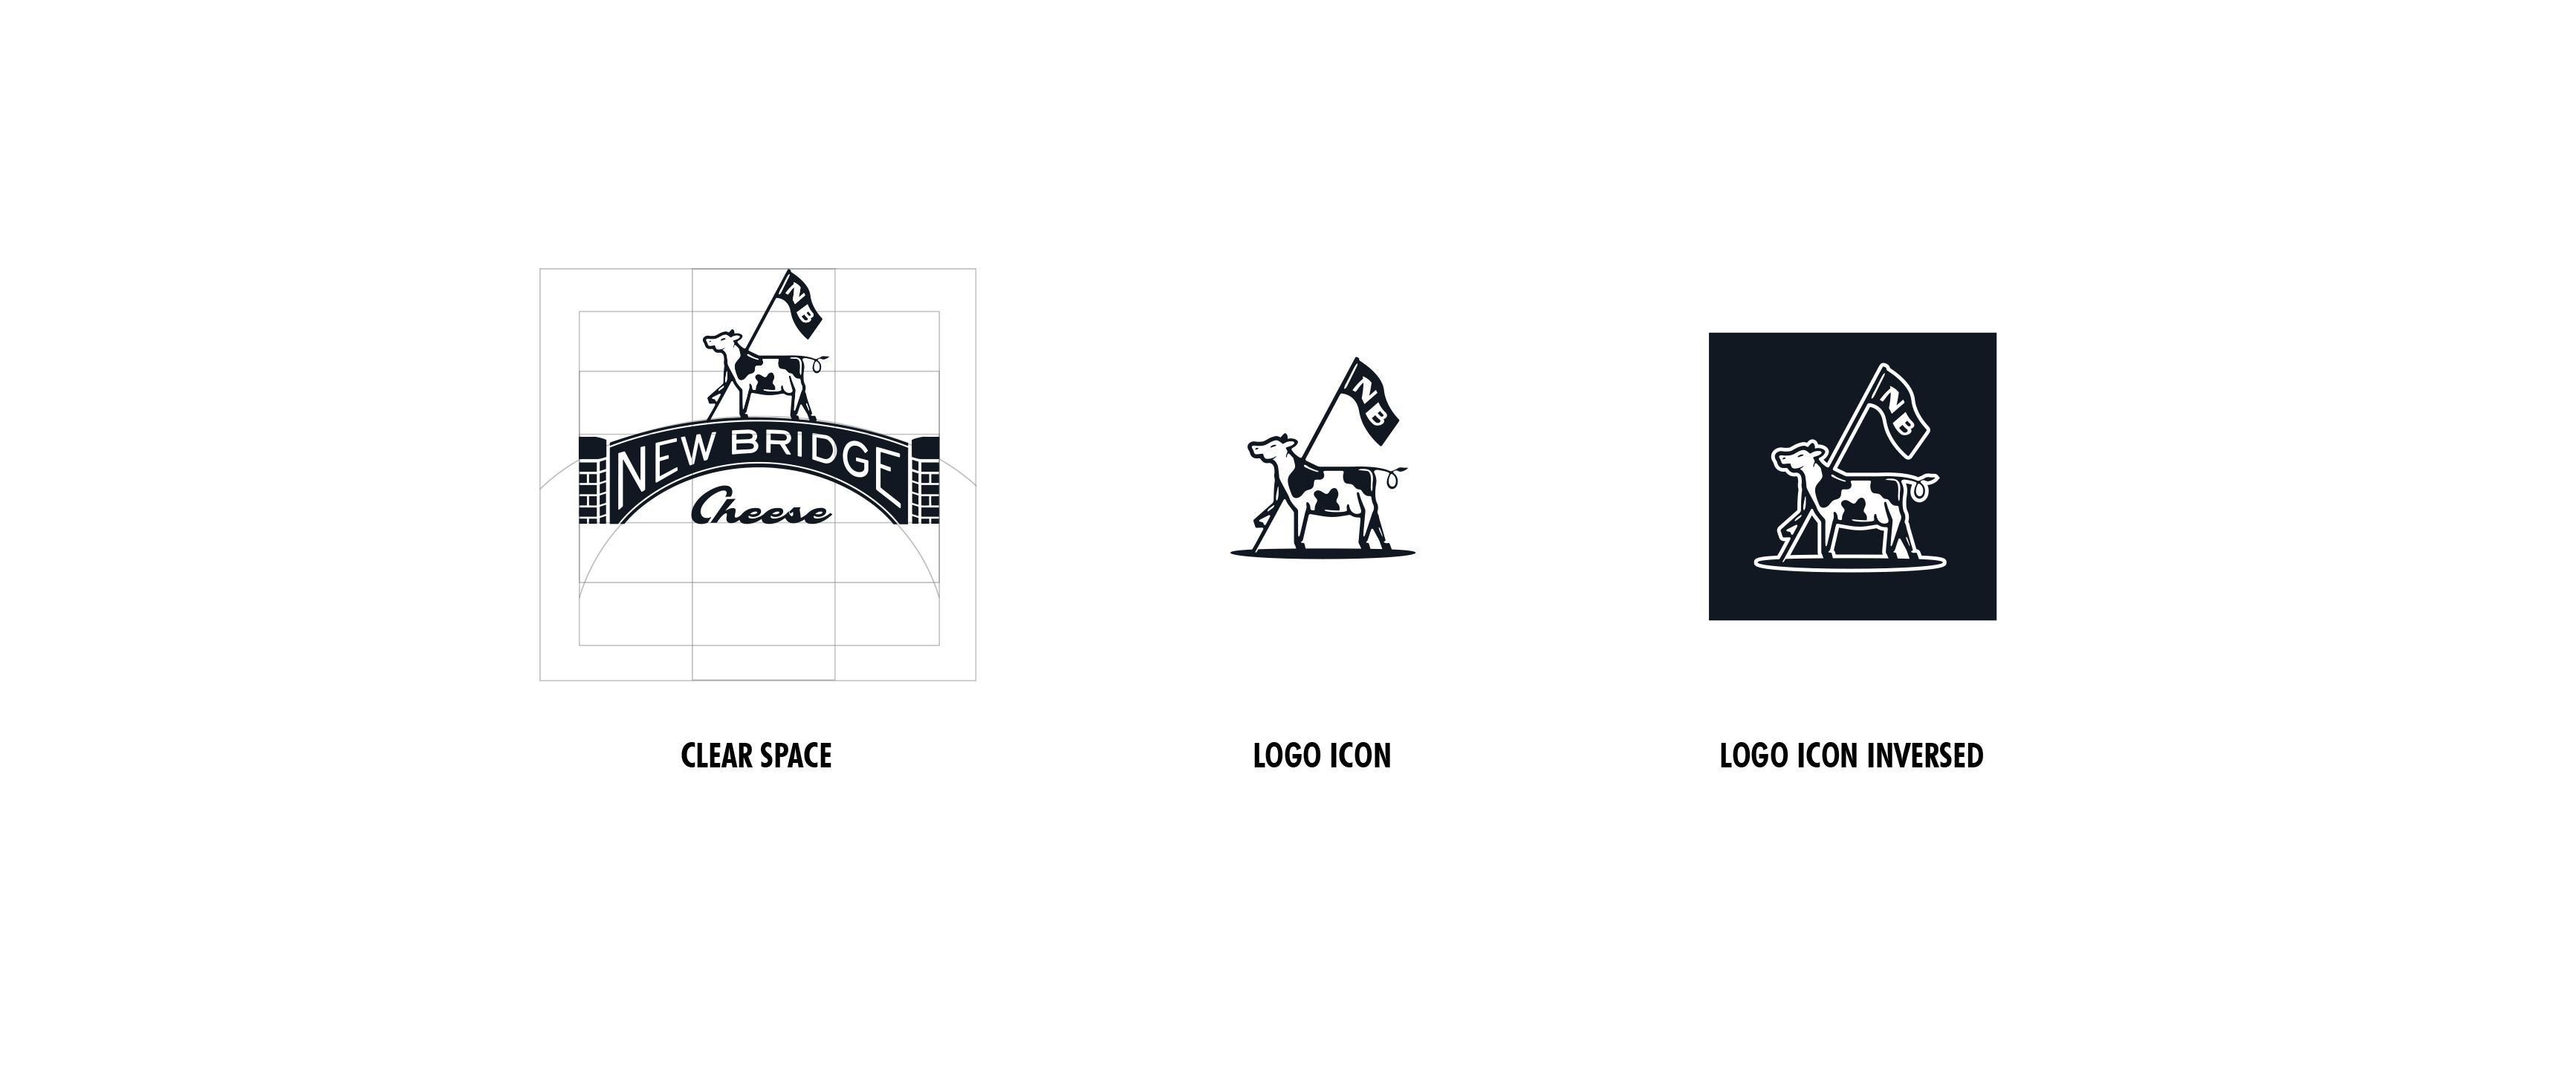 logo-2-new-bridge-cheese-design-exploration-zeki-michael-design-cheese-cow-spread-tub-sku-range-agency-branding copy